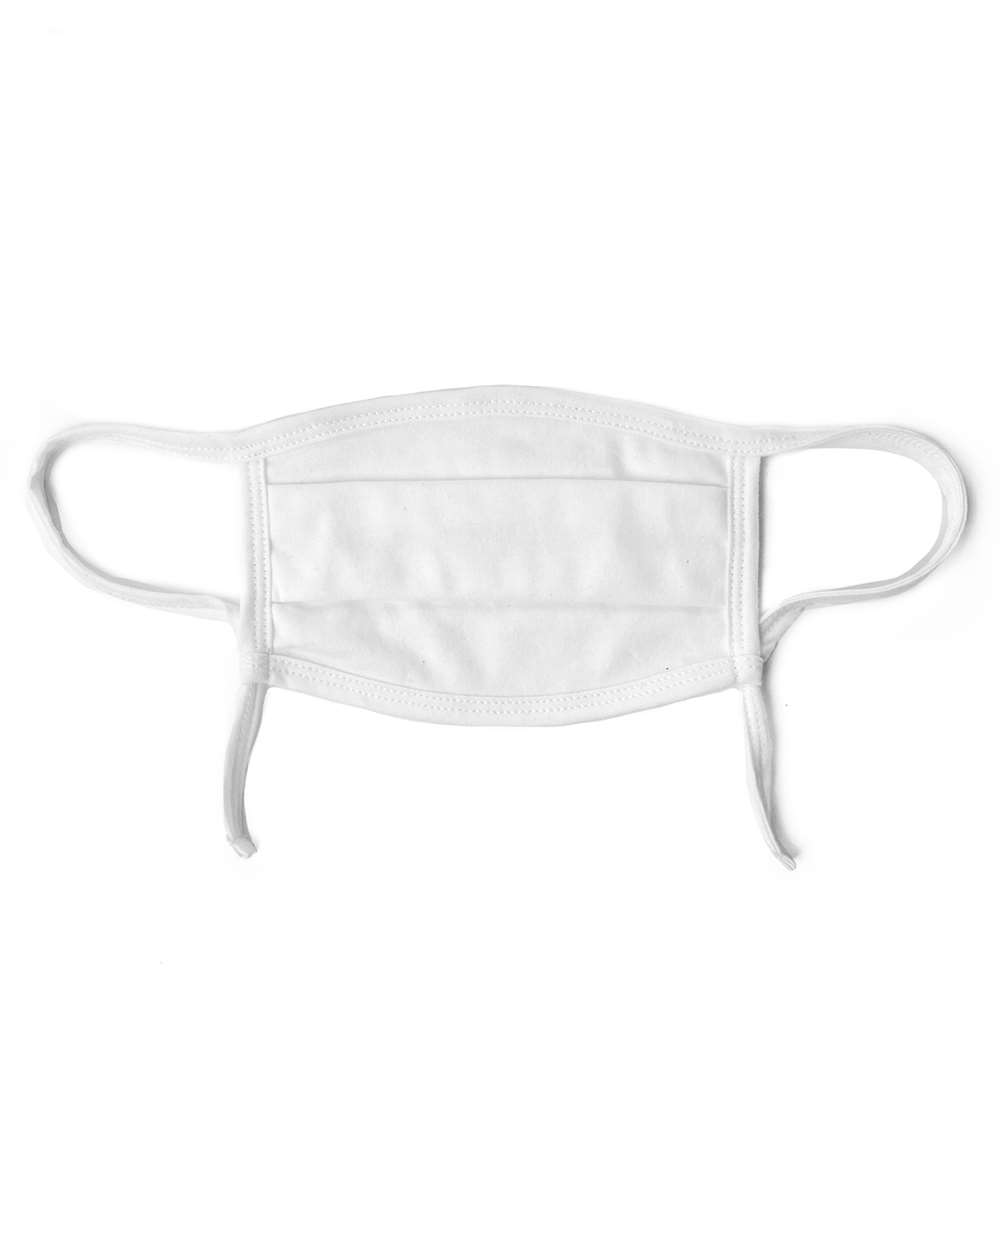 Sportsman Caps MAV25 - Maverick Adjustable Comfort Face Mask